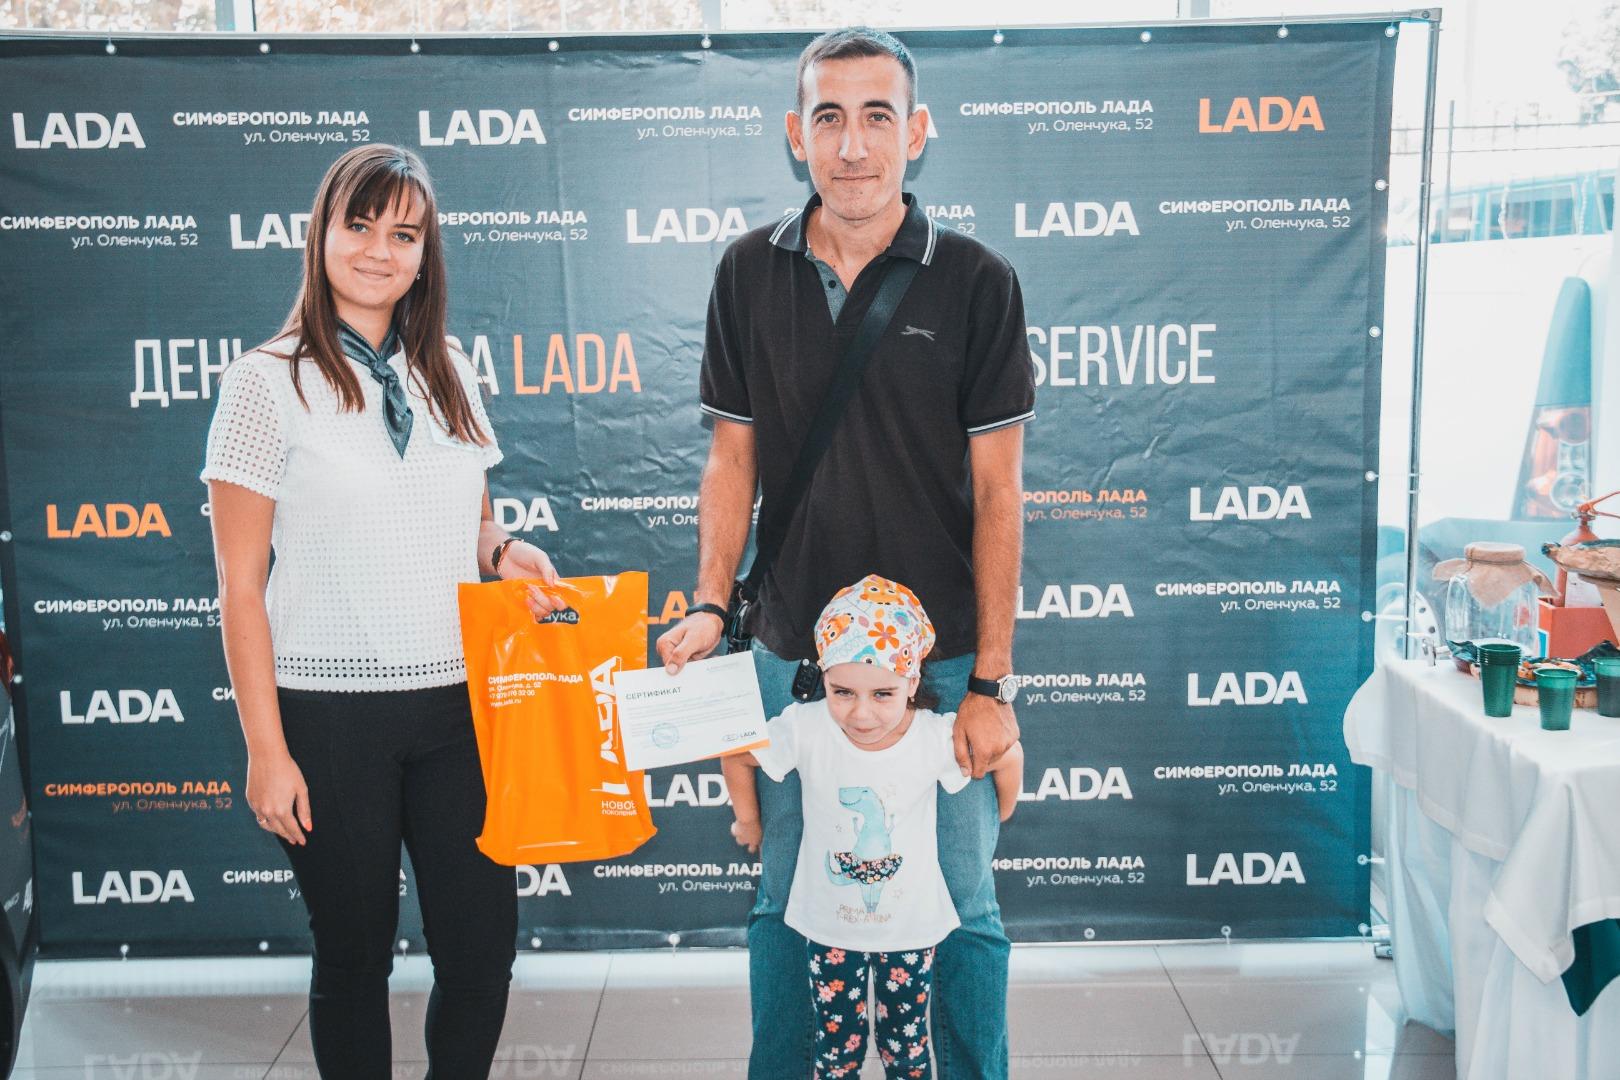 В ДЦ Симферополь Лада прошёл LADA DAY SERVICE